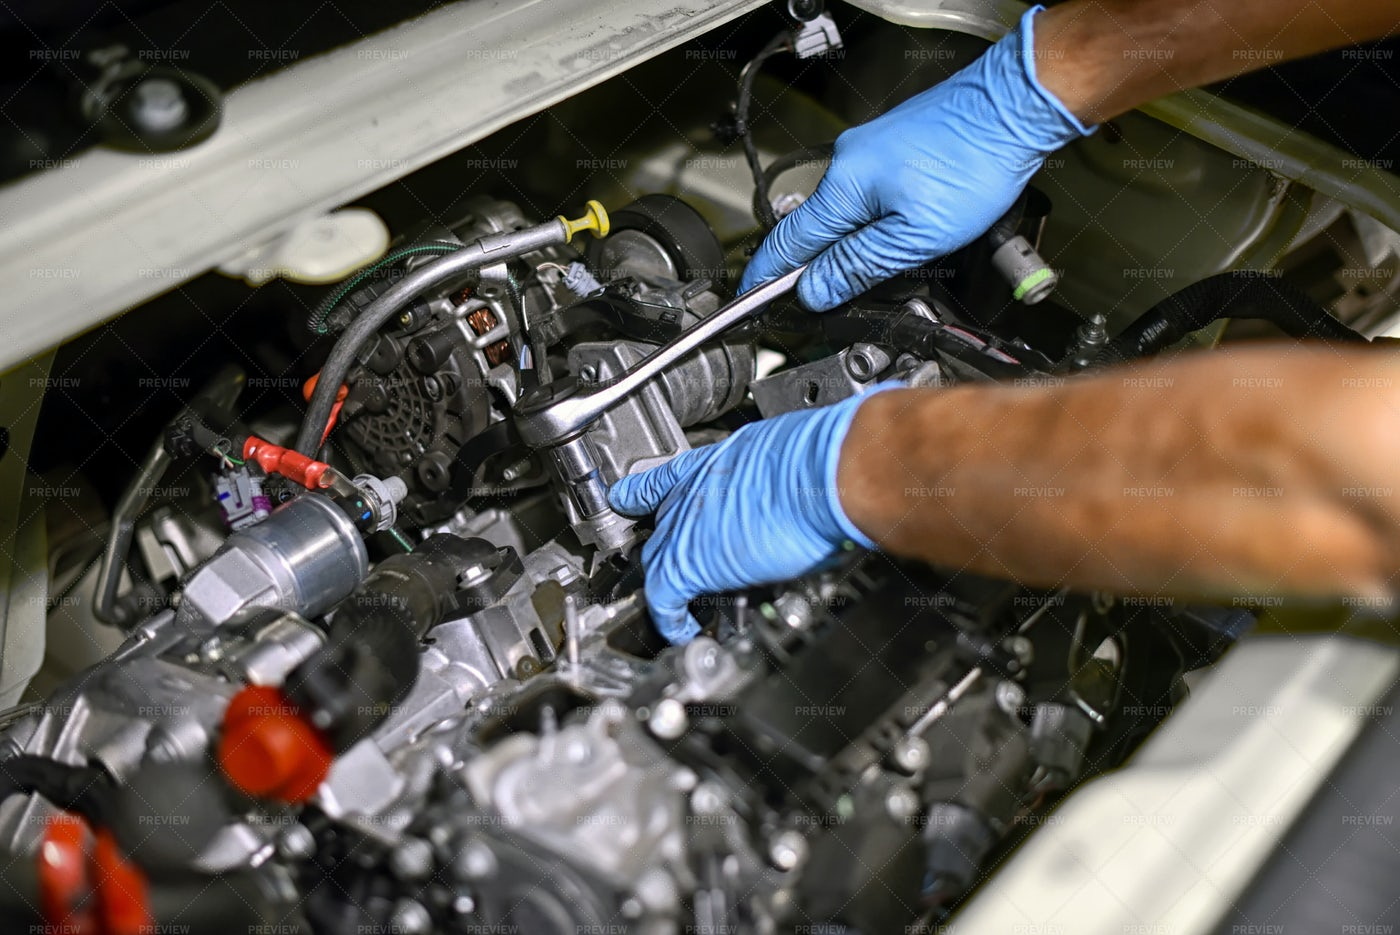 Mechanic Works On An Engine: Stock Photos